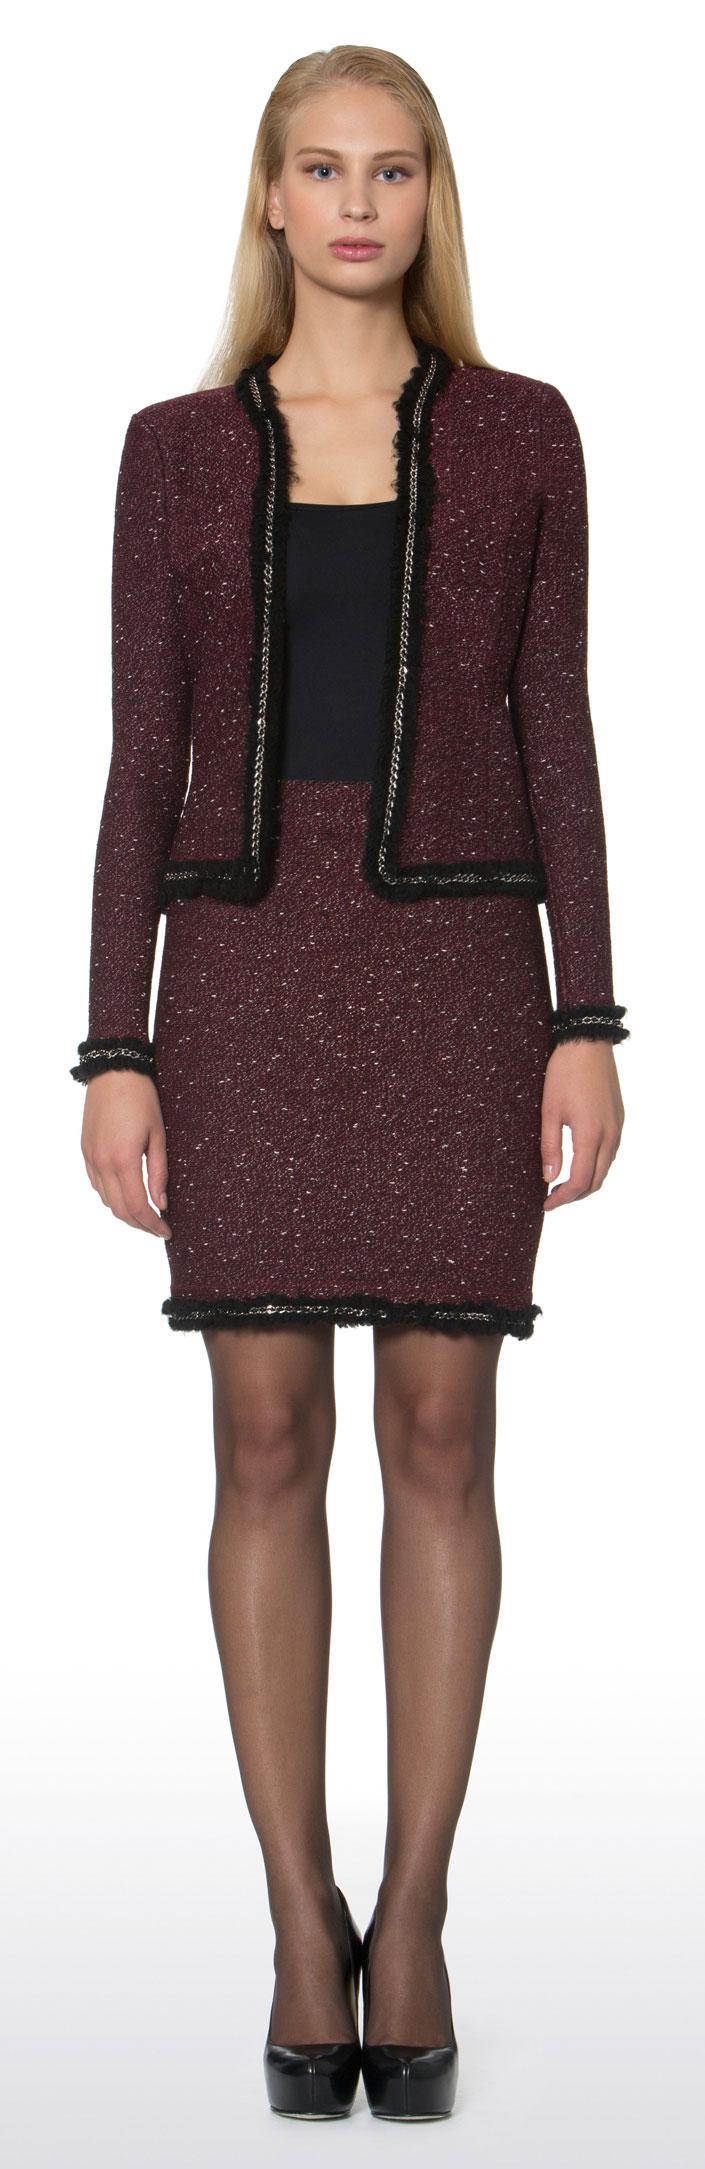 Z-Form-Uniform-Kelsy-Zimba-Jacket-FJ9-Skirt-FS8.jpg